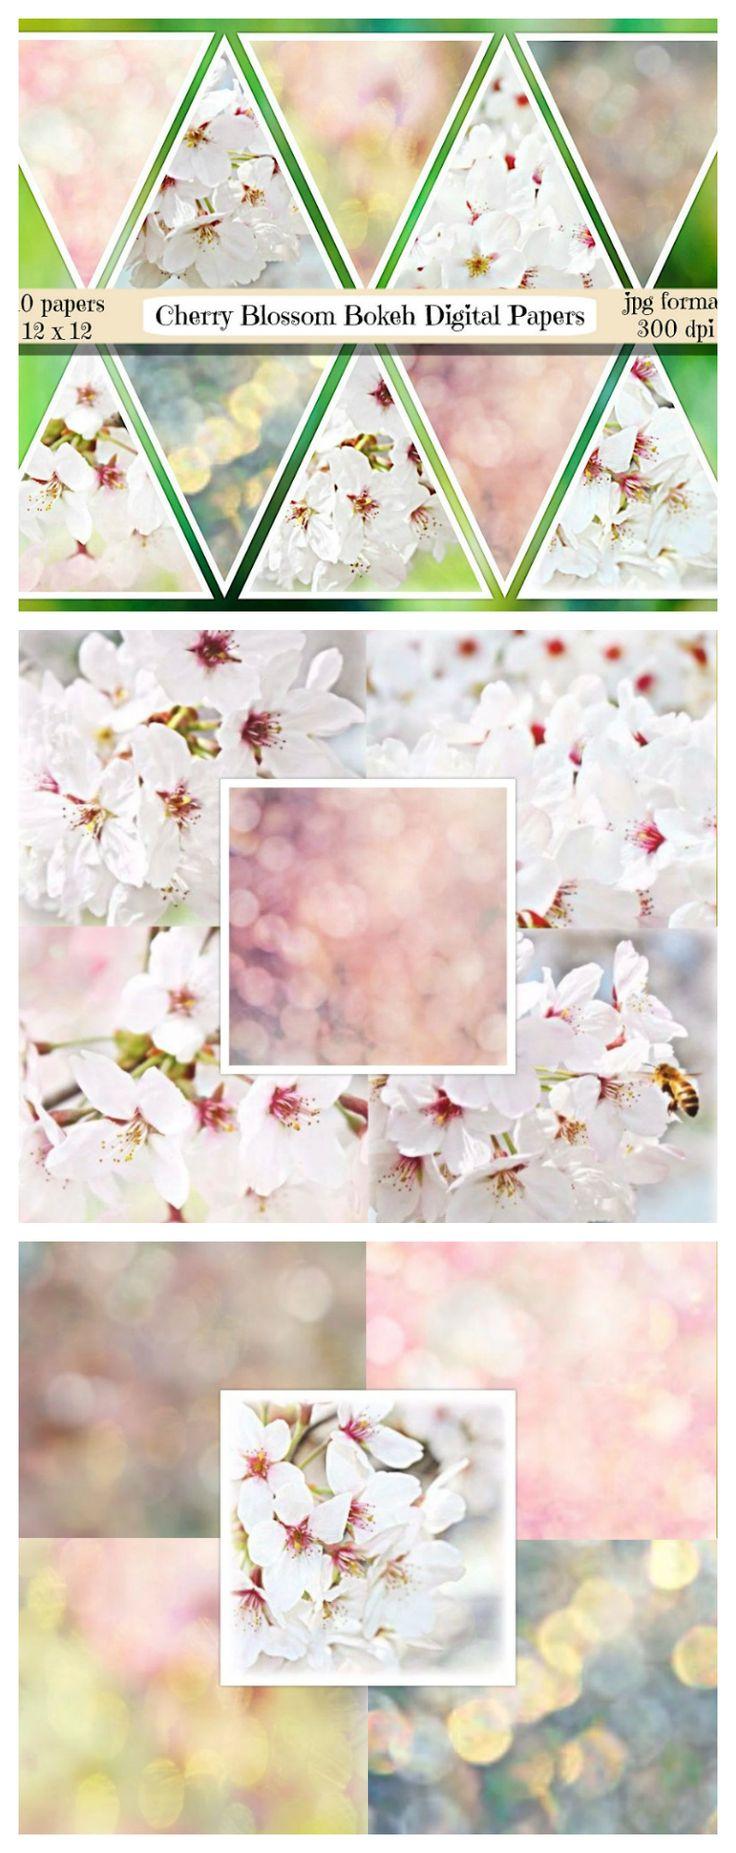 Scrapbook paper england - Cherry Blossom Digital Papers Cherry Blossom Scrapbooking Bokeh Digital Papers Bokeh Background Spring Scrapbooking Bokeh Textures